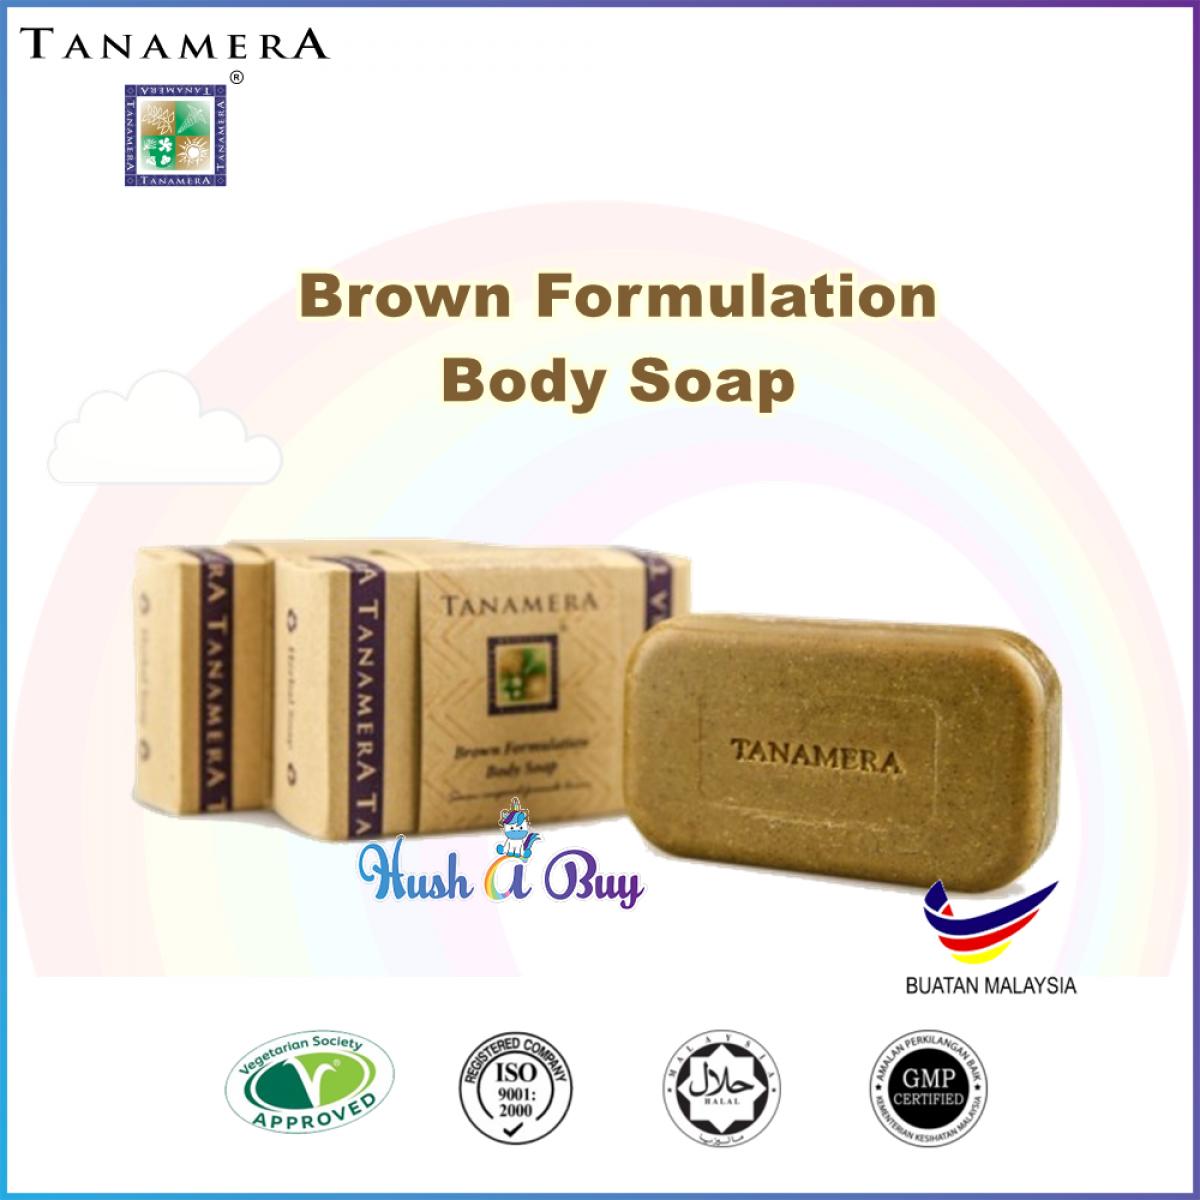 Tanamera Formulation Body Soap 125g White, Brown, Green, Black